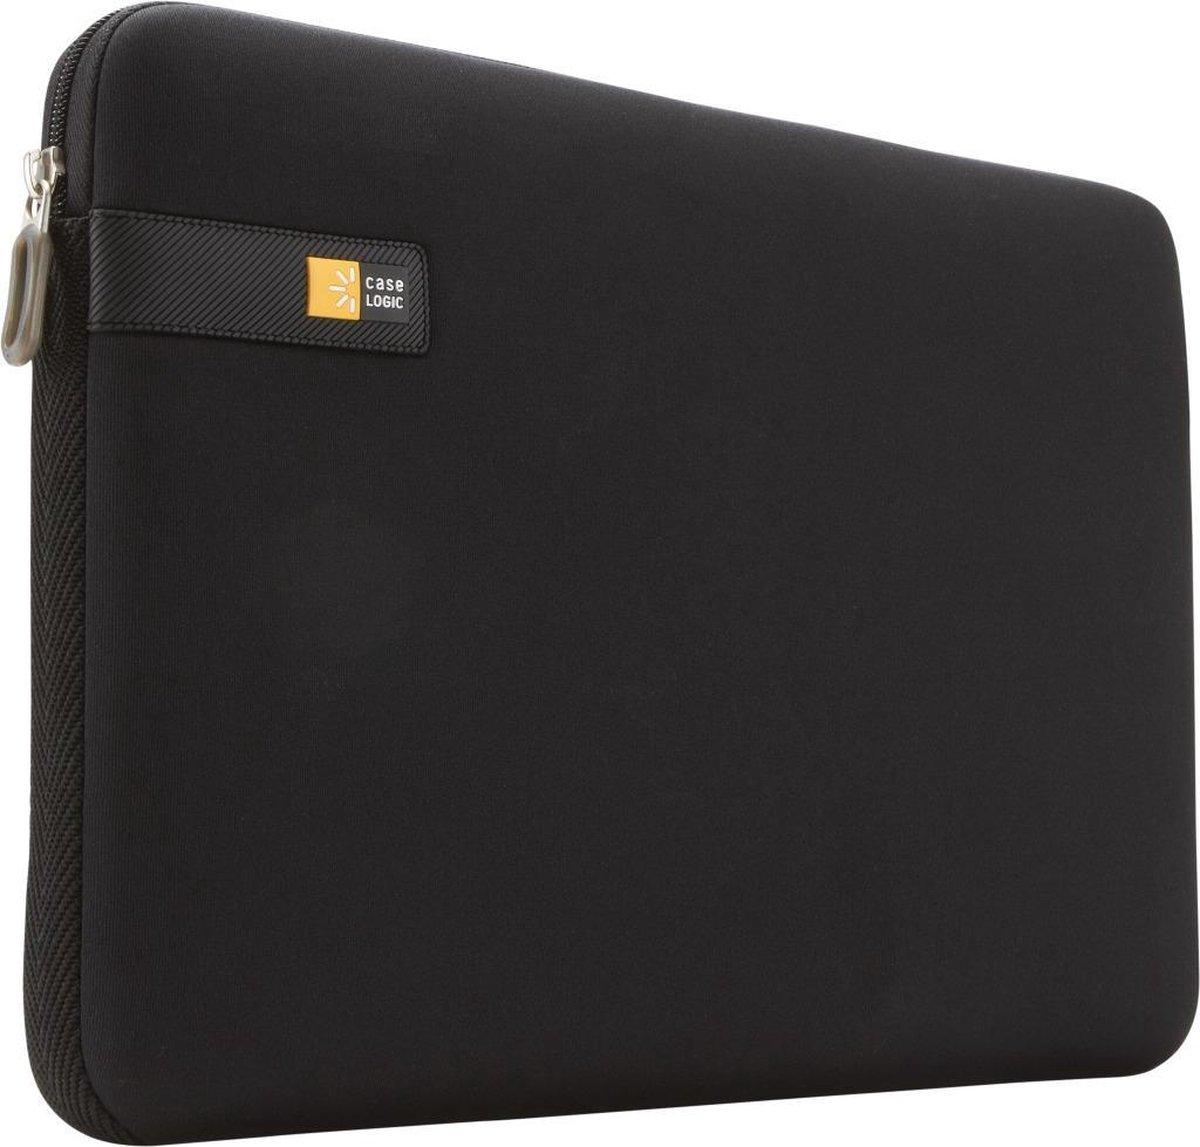 Case Logic LAPS113 - Laptophoes & MacBook Sleeve 13 inch - Zwart